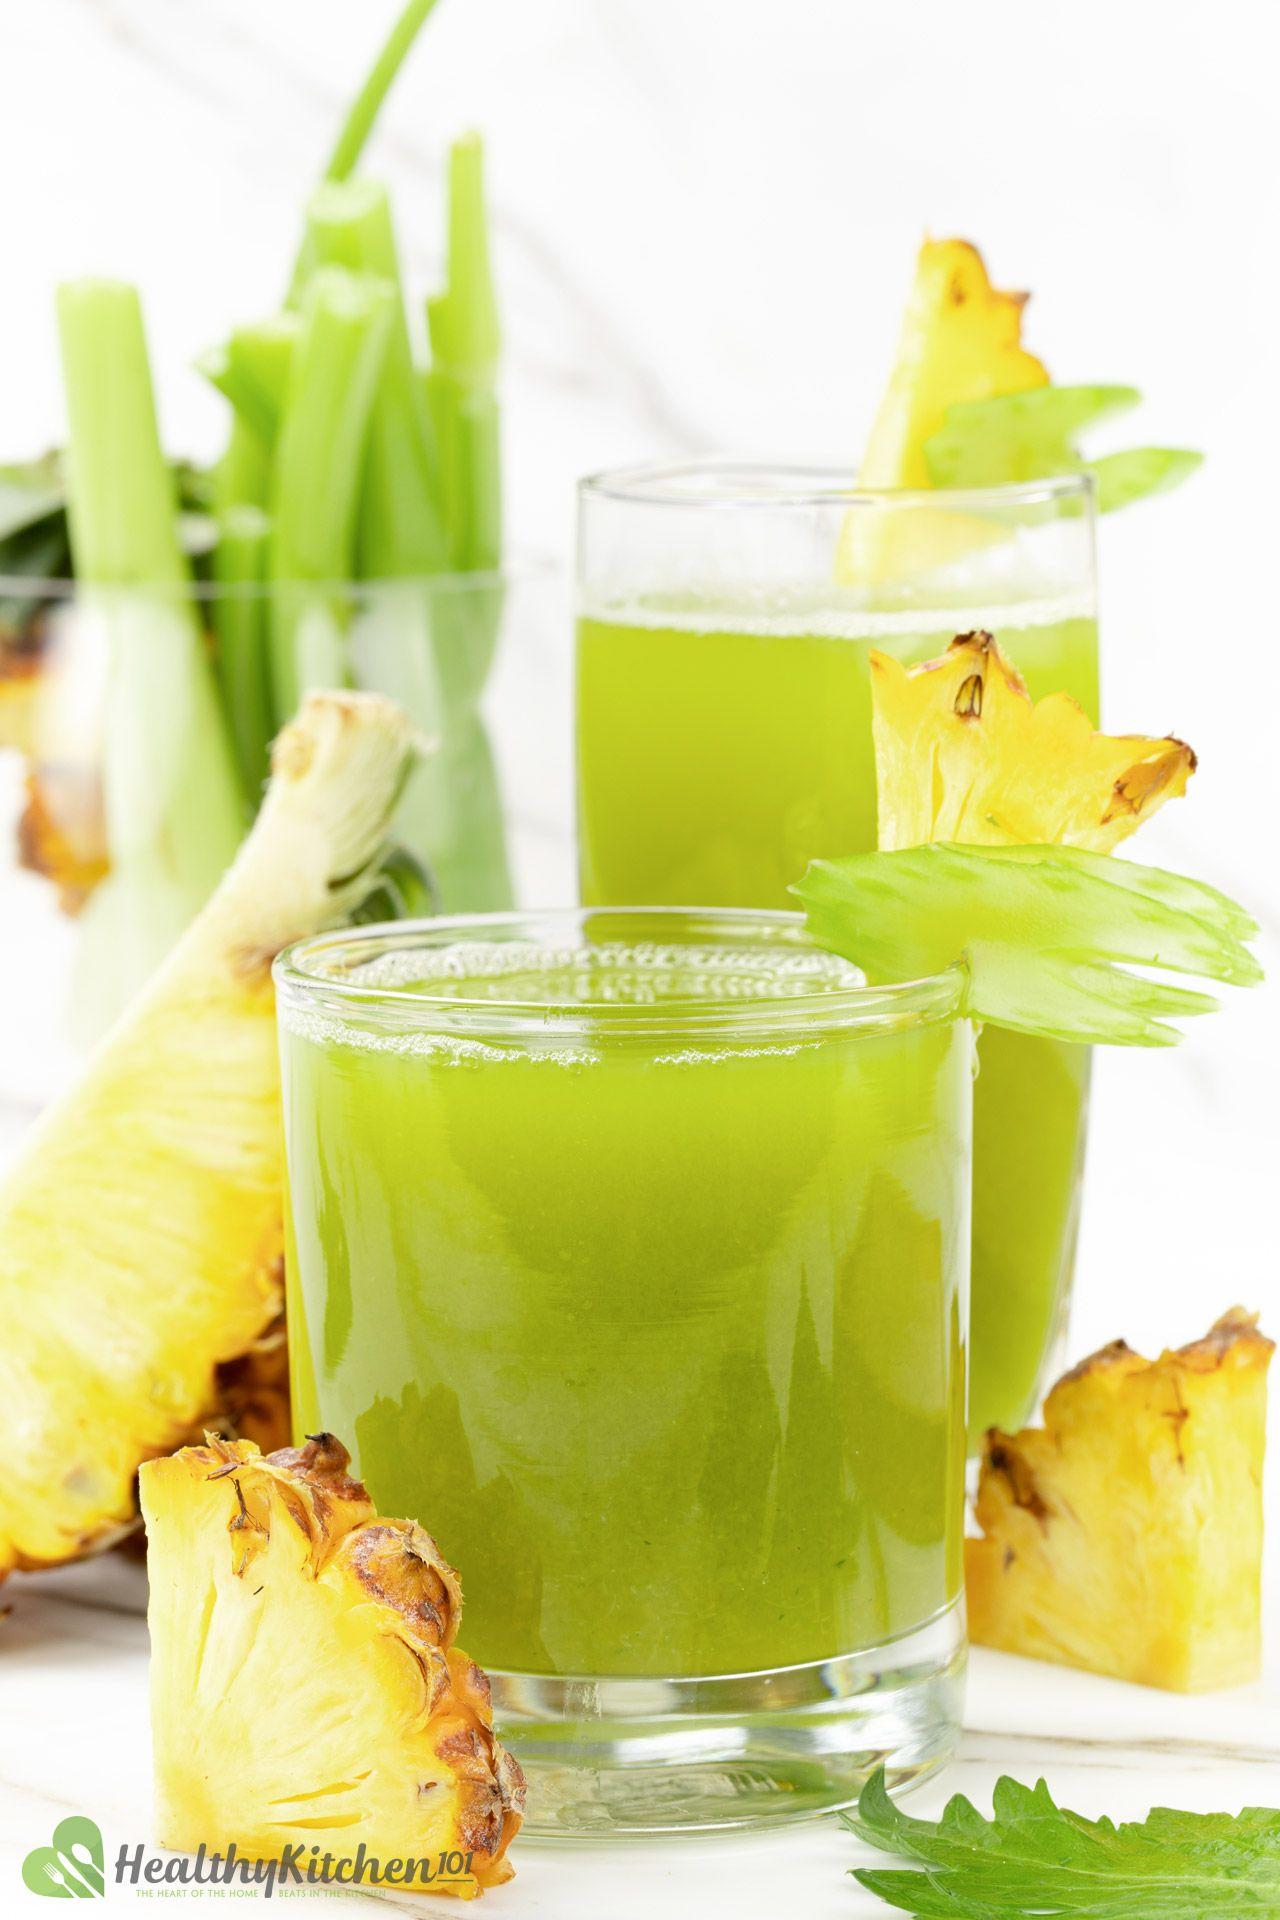 Homemade Healthy Pineapple Celery Juice Recipe